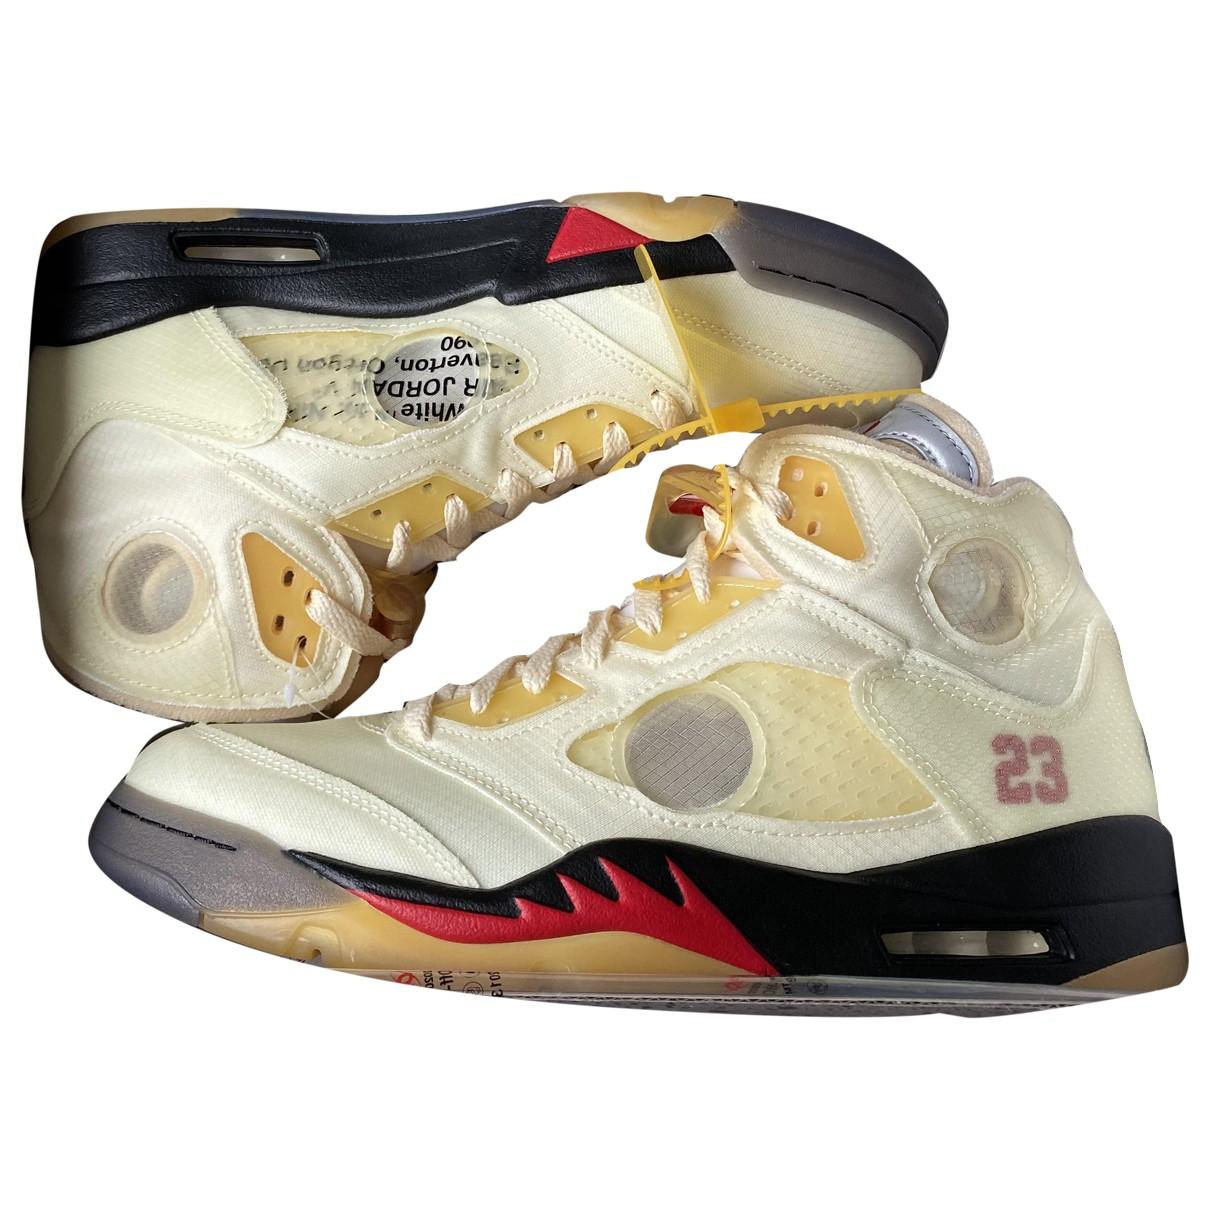 Deportivas Jordan 5 Nike X Off-white